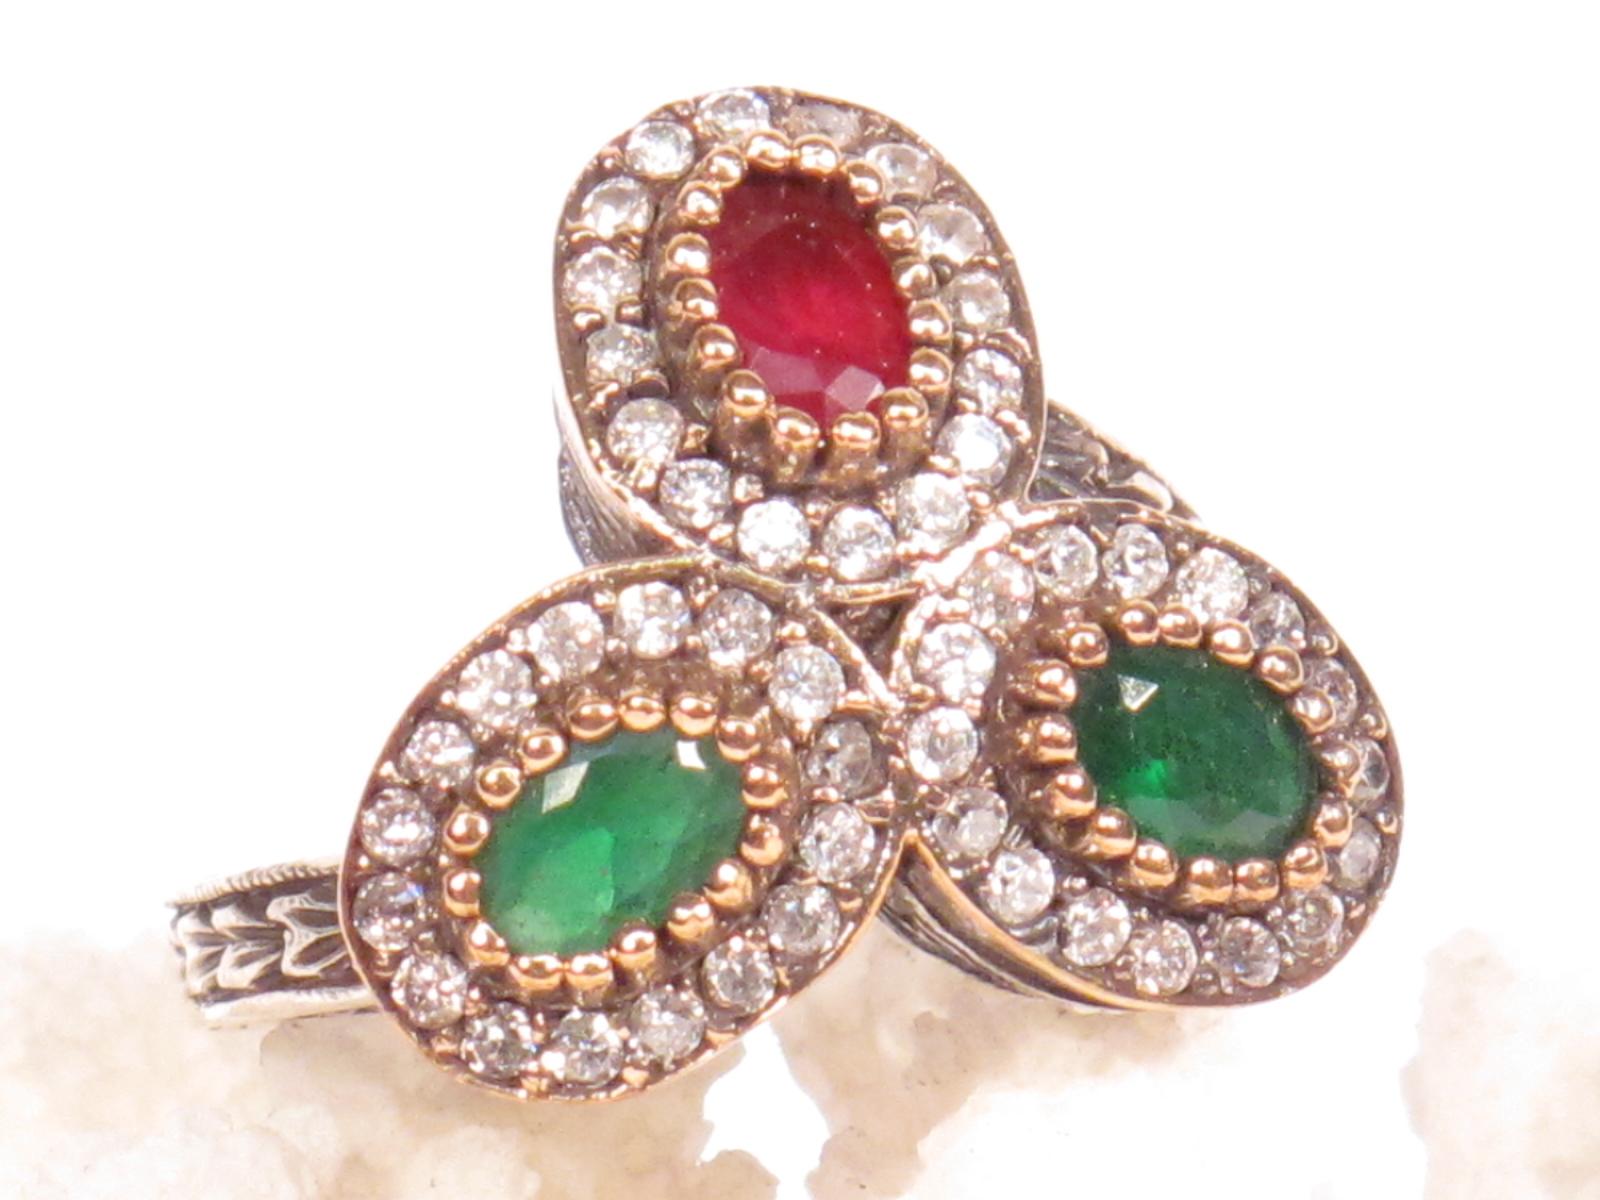 anello turco in zirconi paste vitree argento e bronzo